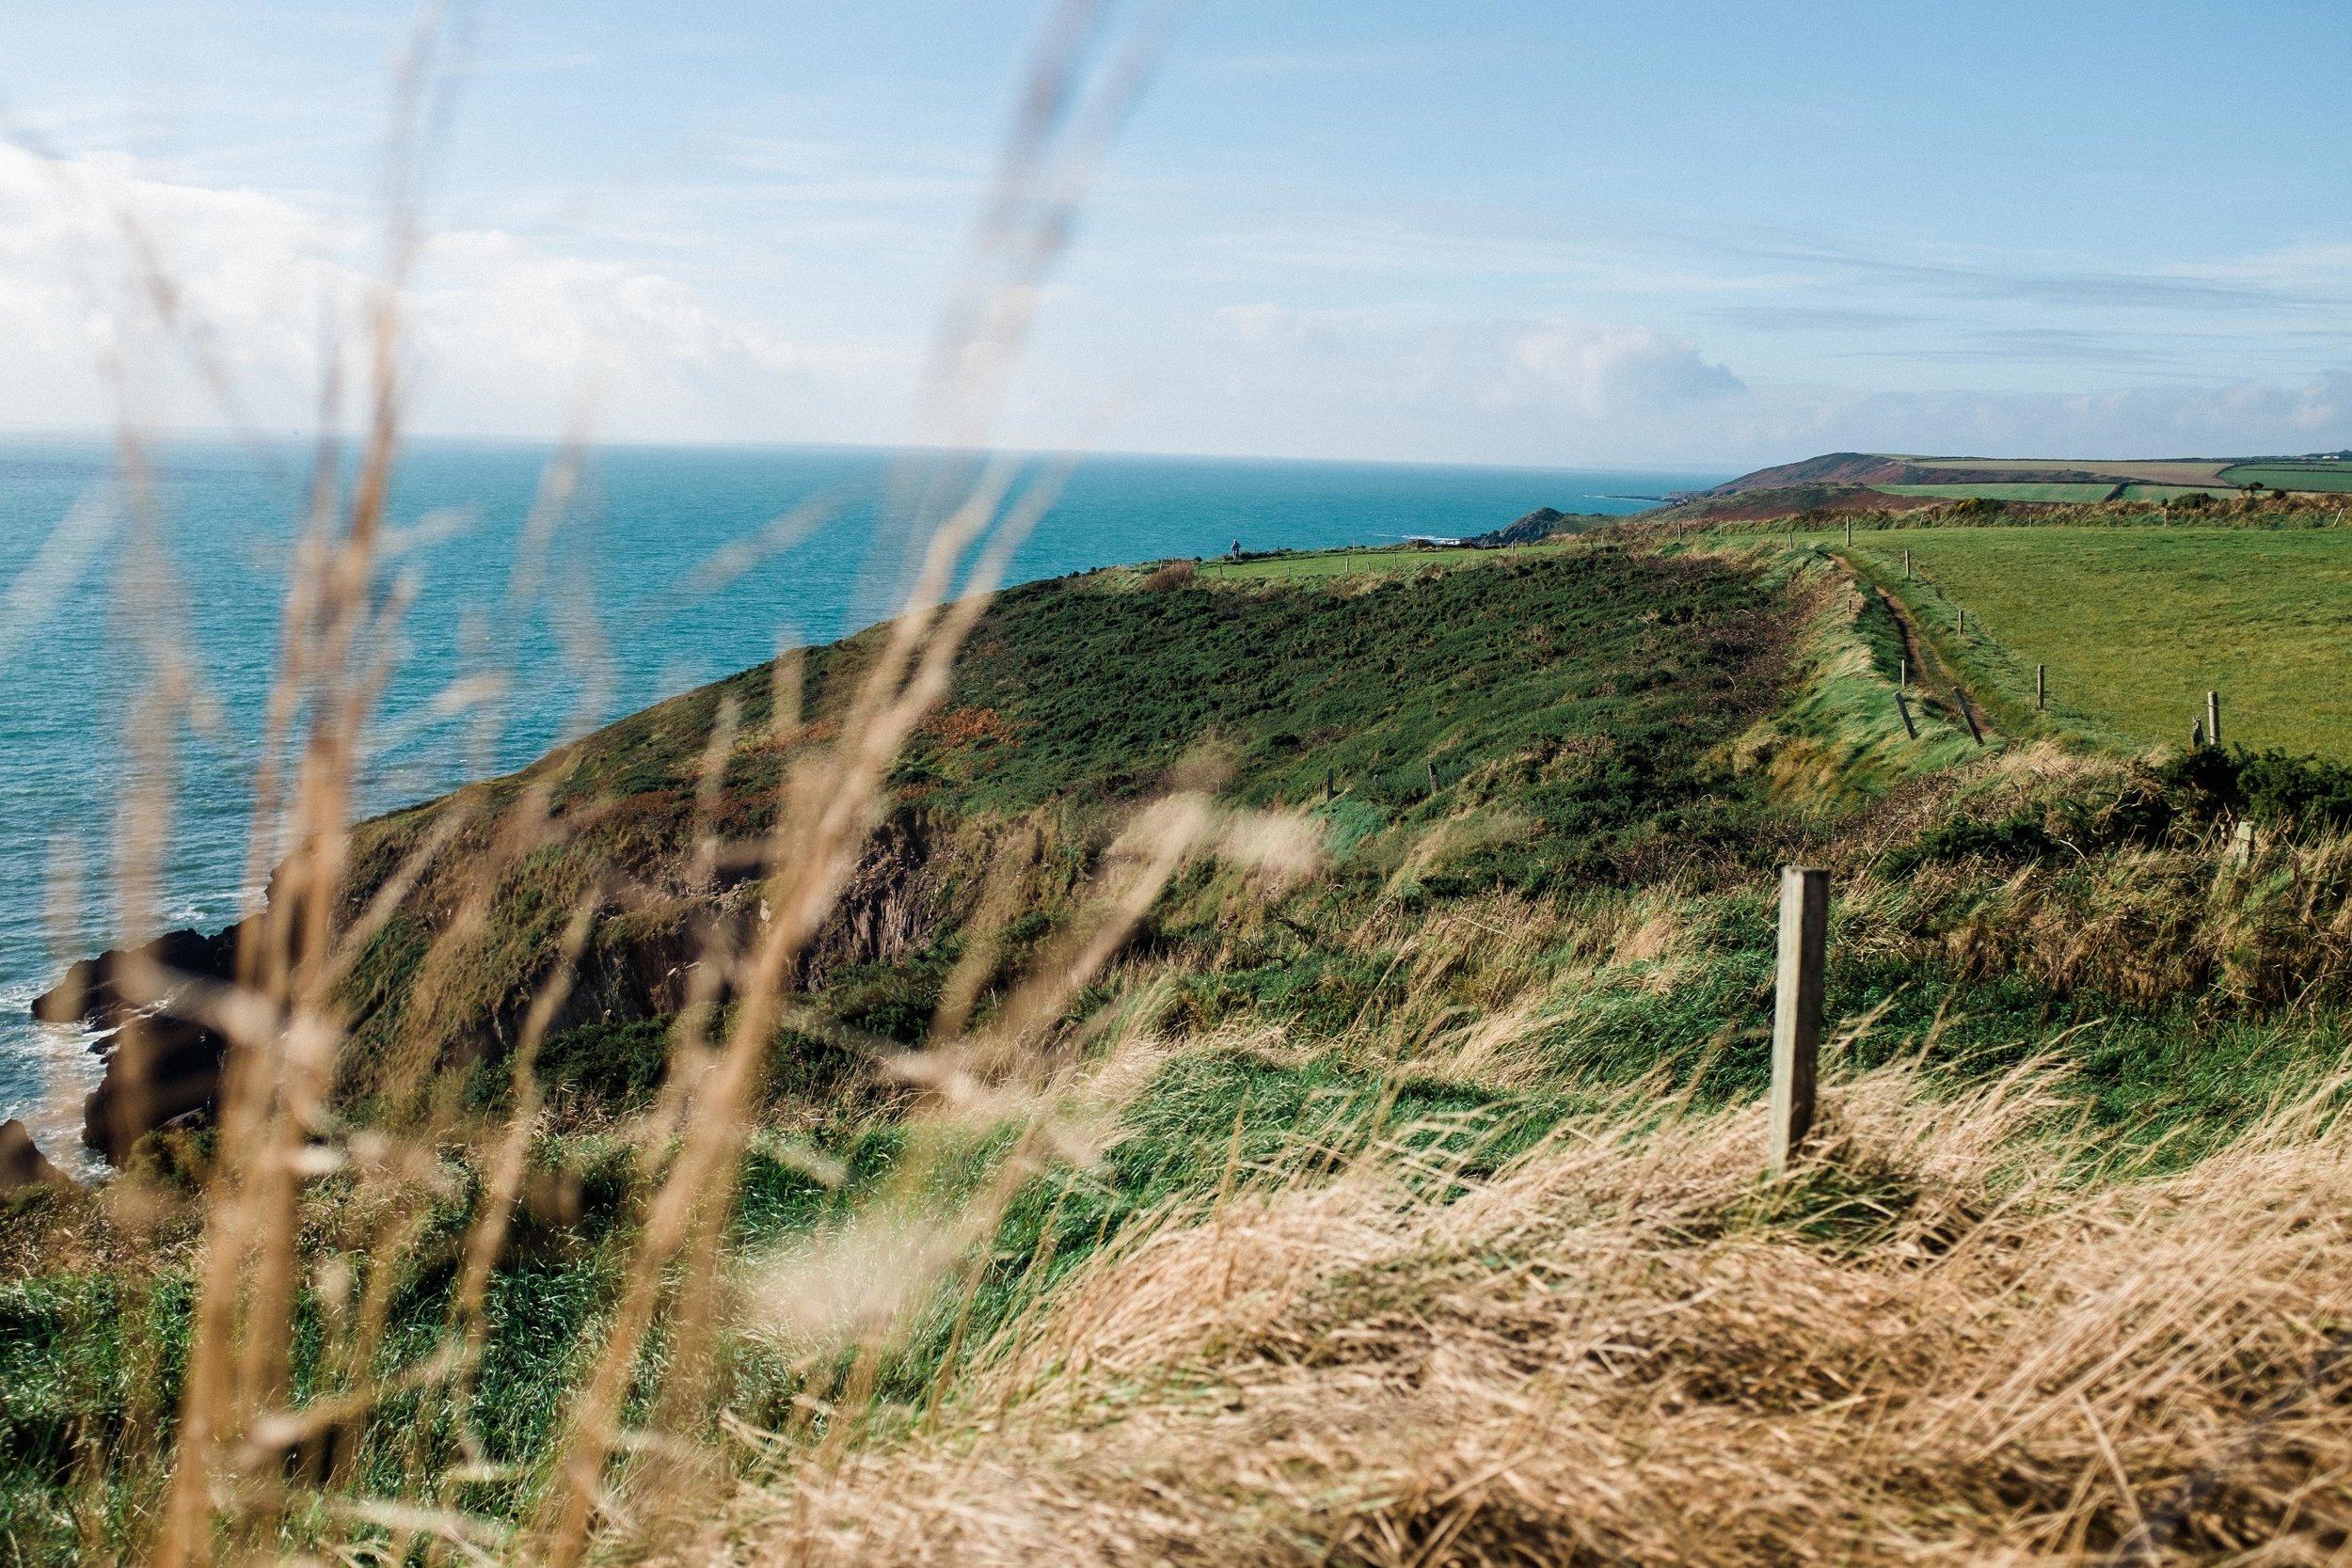 ballycotton-ireland-cliff-walk-5971.jpg